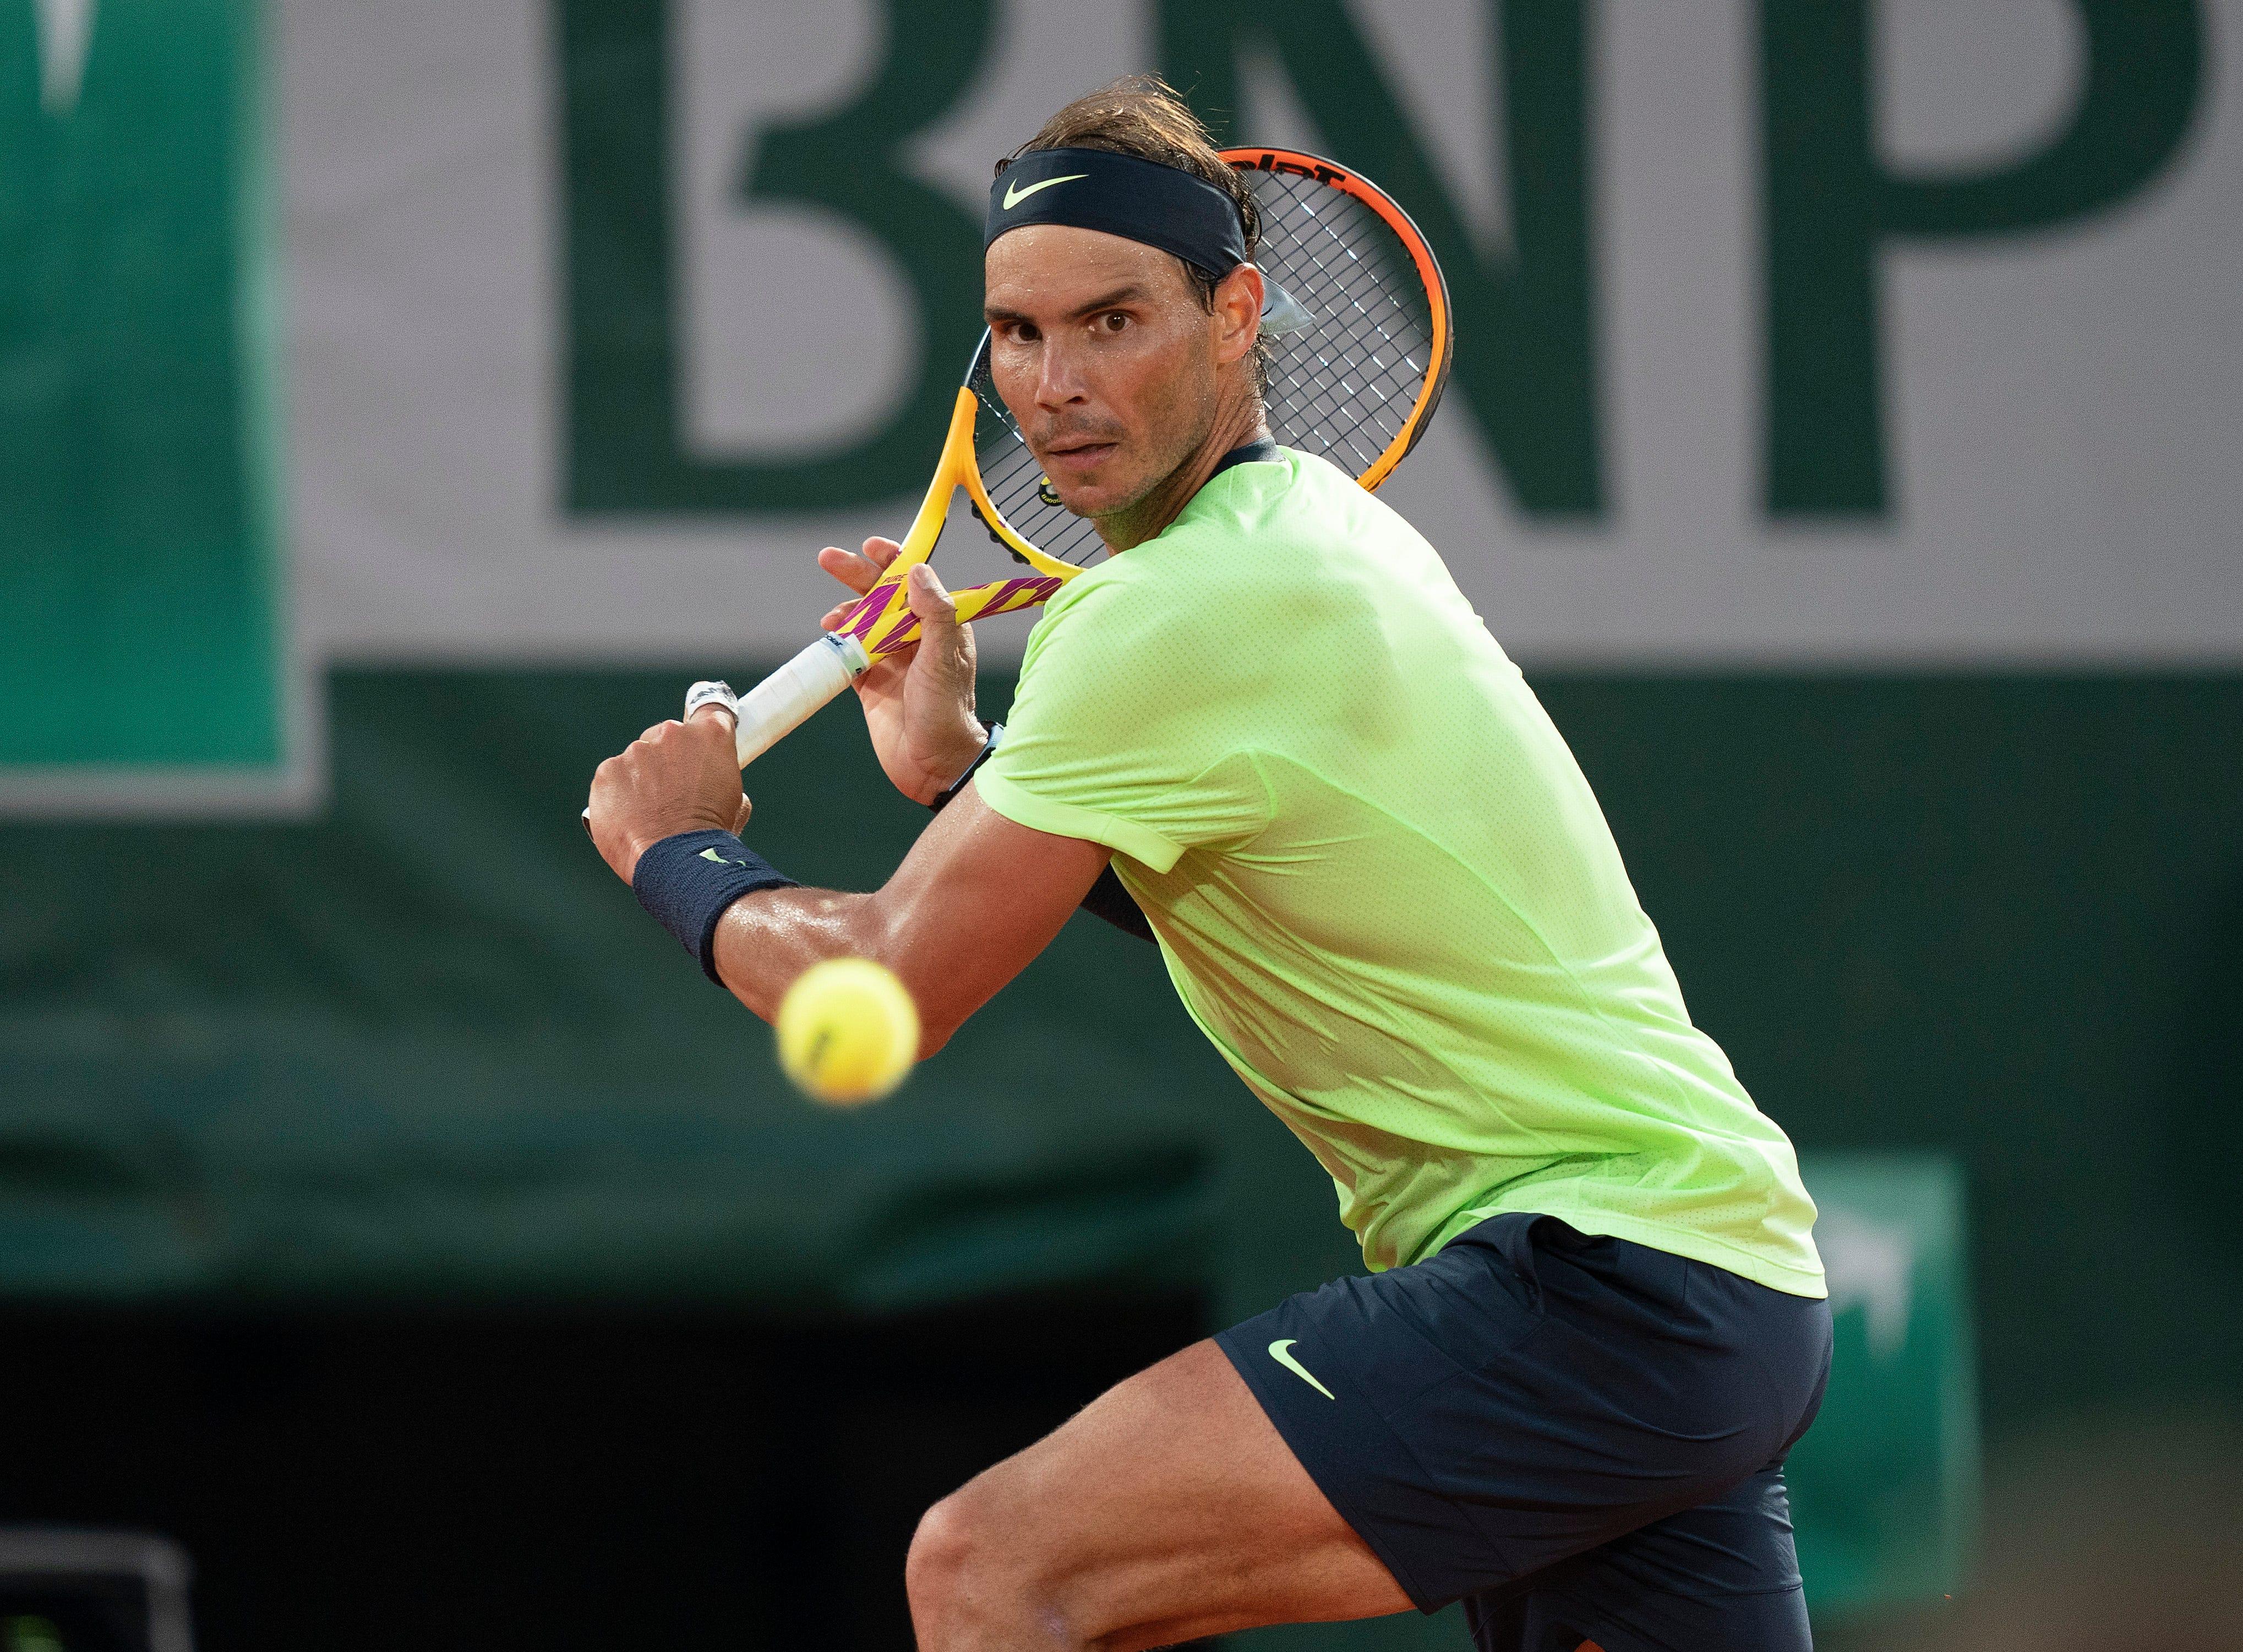 Rafael Nadal says he won't play at Wimbledon or Tokyo Olympics to 'prolong career'